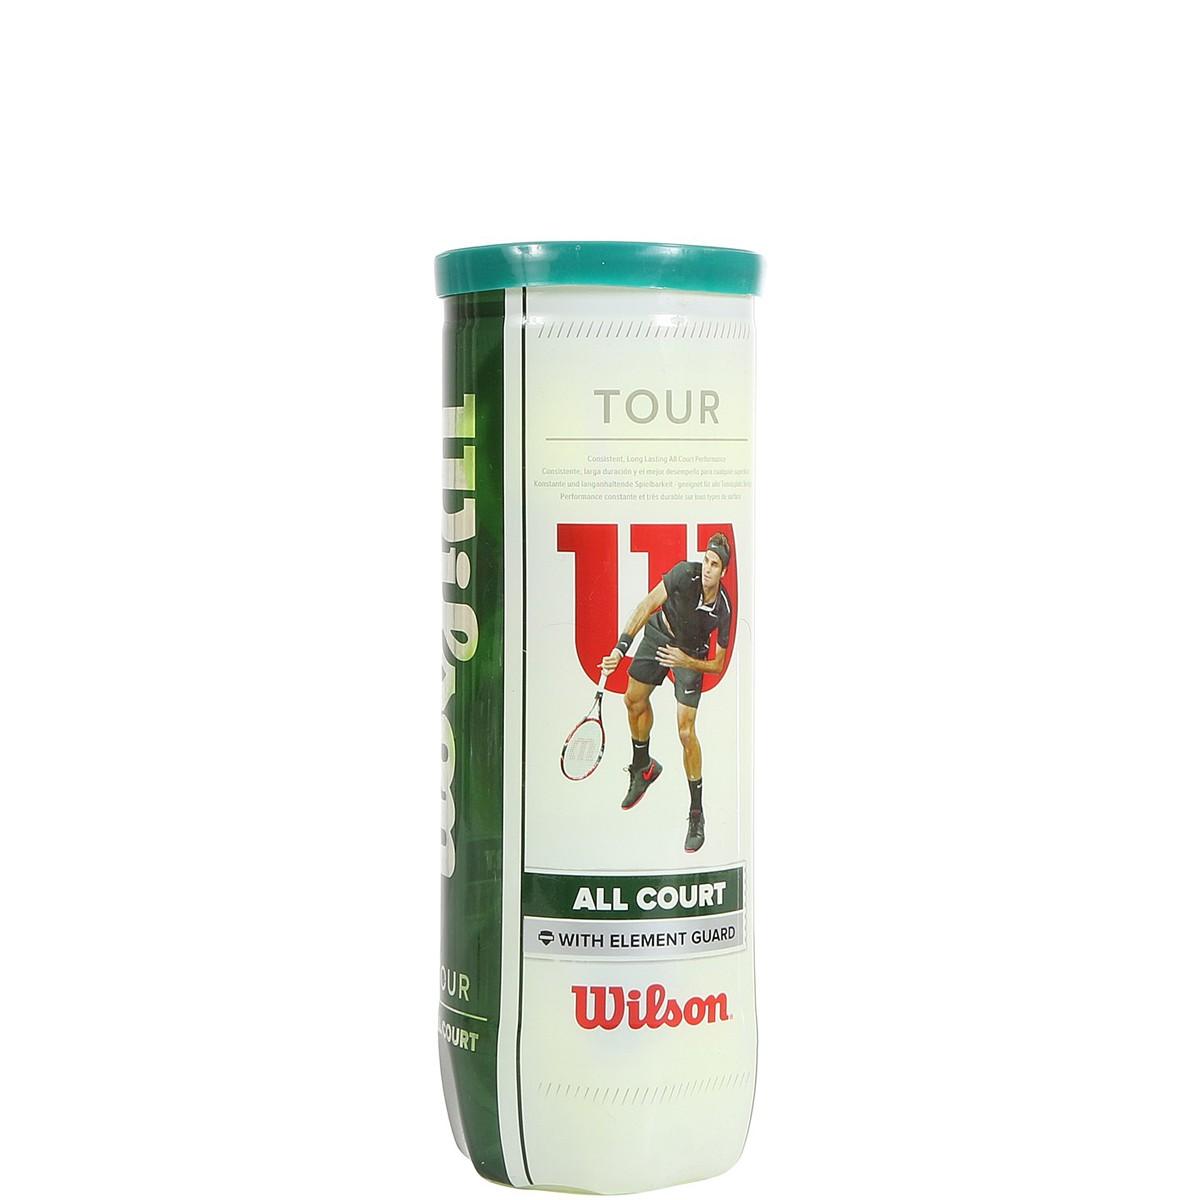 TUBE DE 3 BALLES WILSON TOUR ALLCOURT